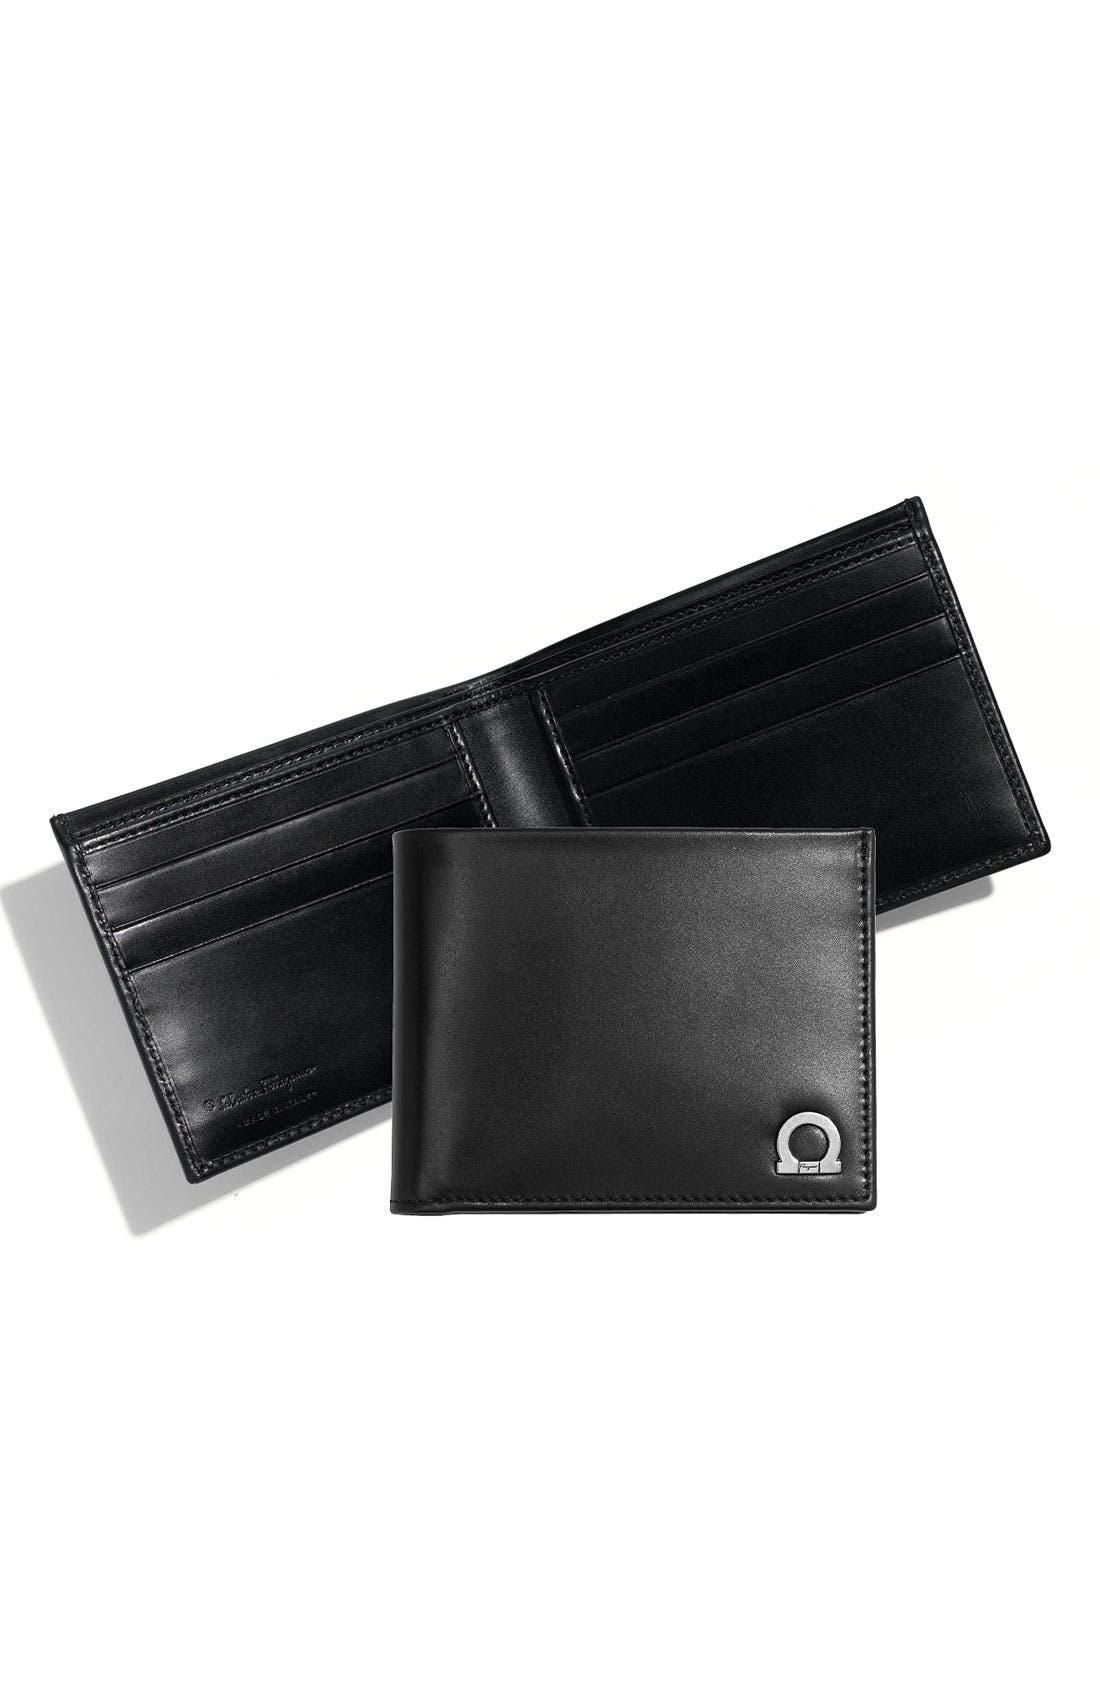 Main Image - Salvatore Ferragamo 'Monte Carlo' Bifold Wallet